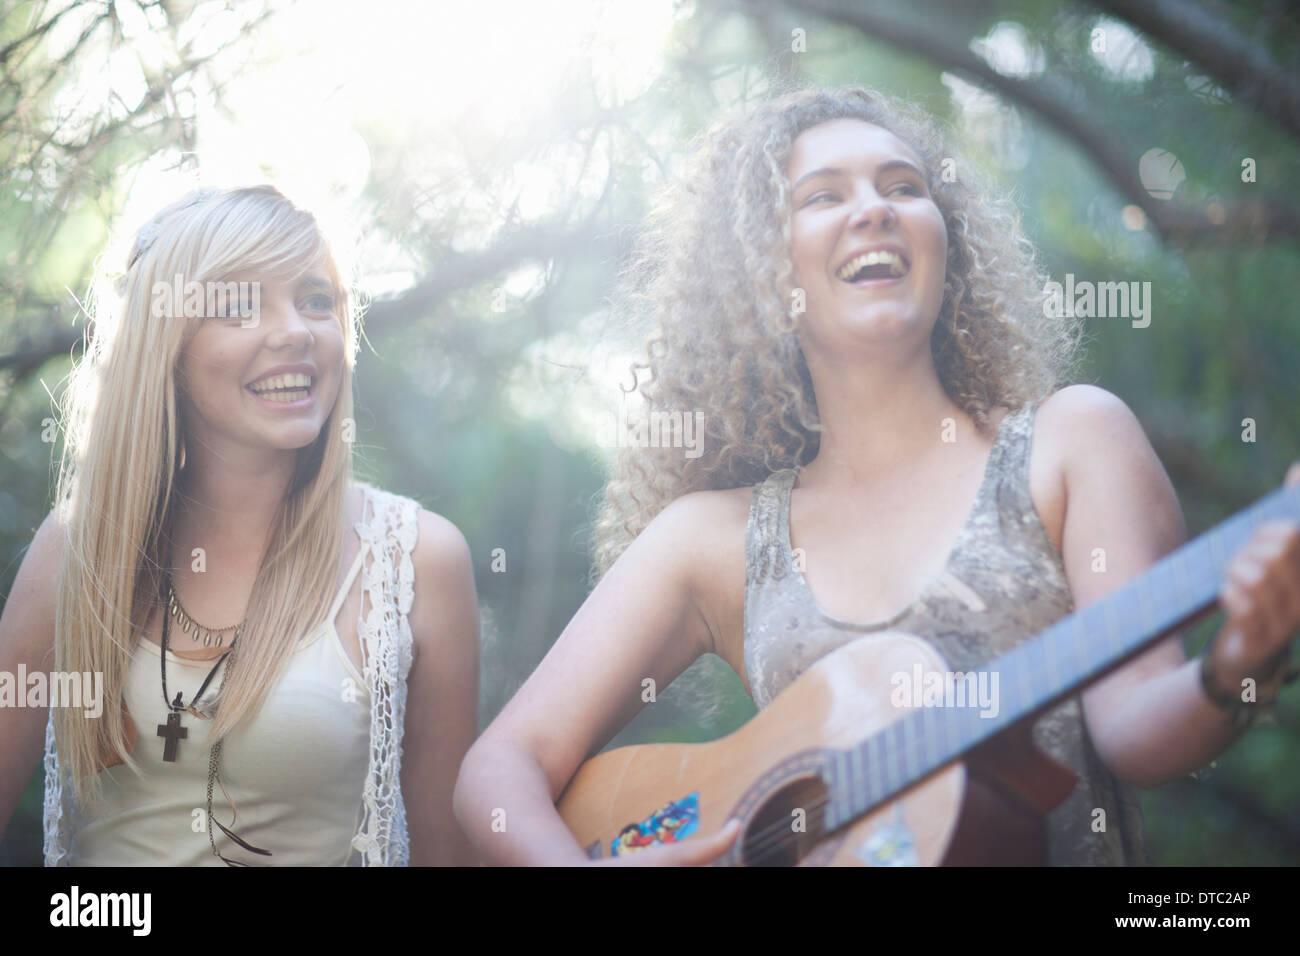 Two teenage girls playing guitar in woodland - Stock Image